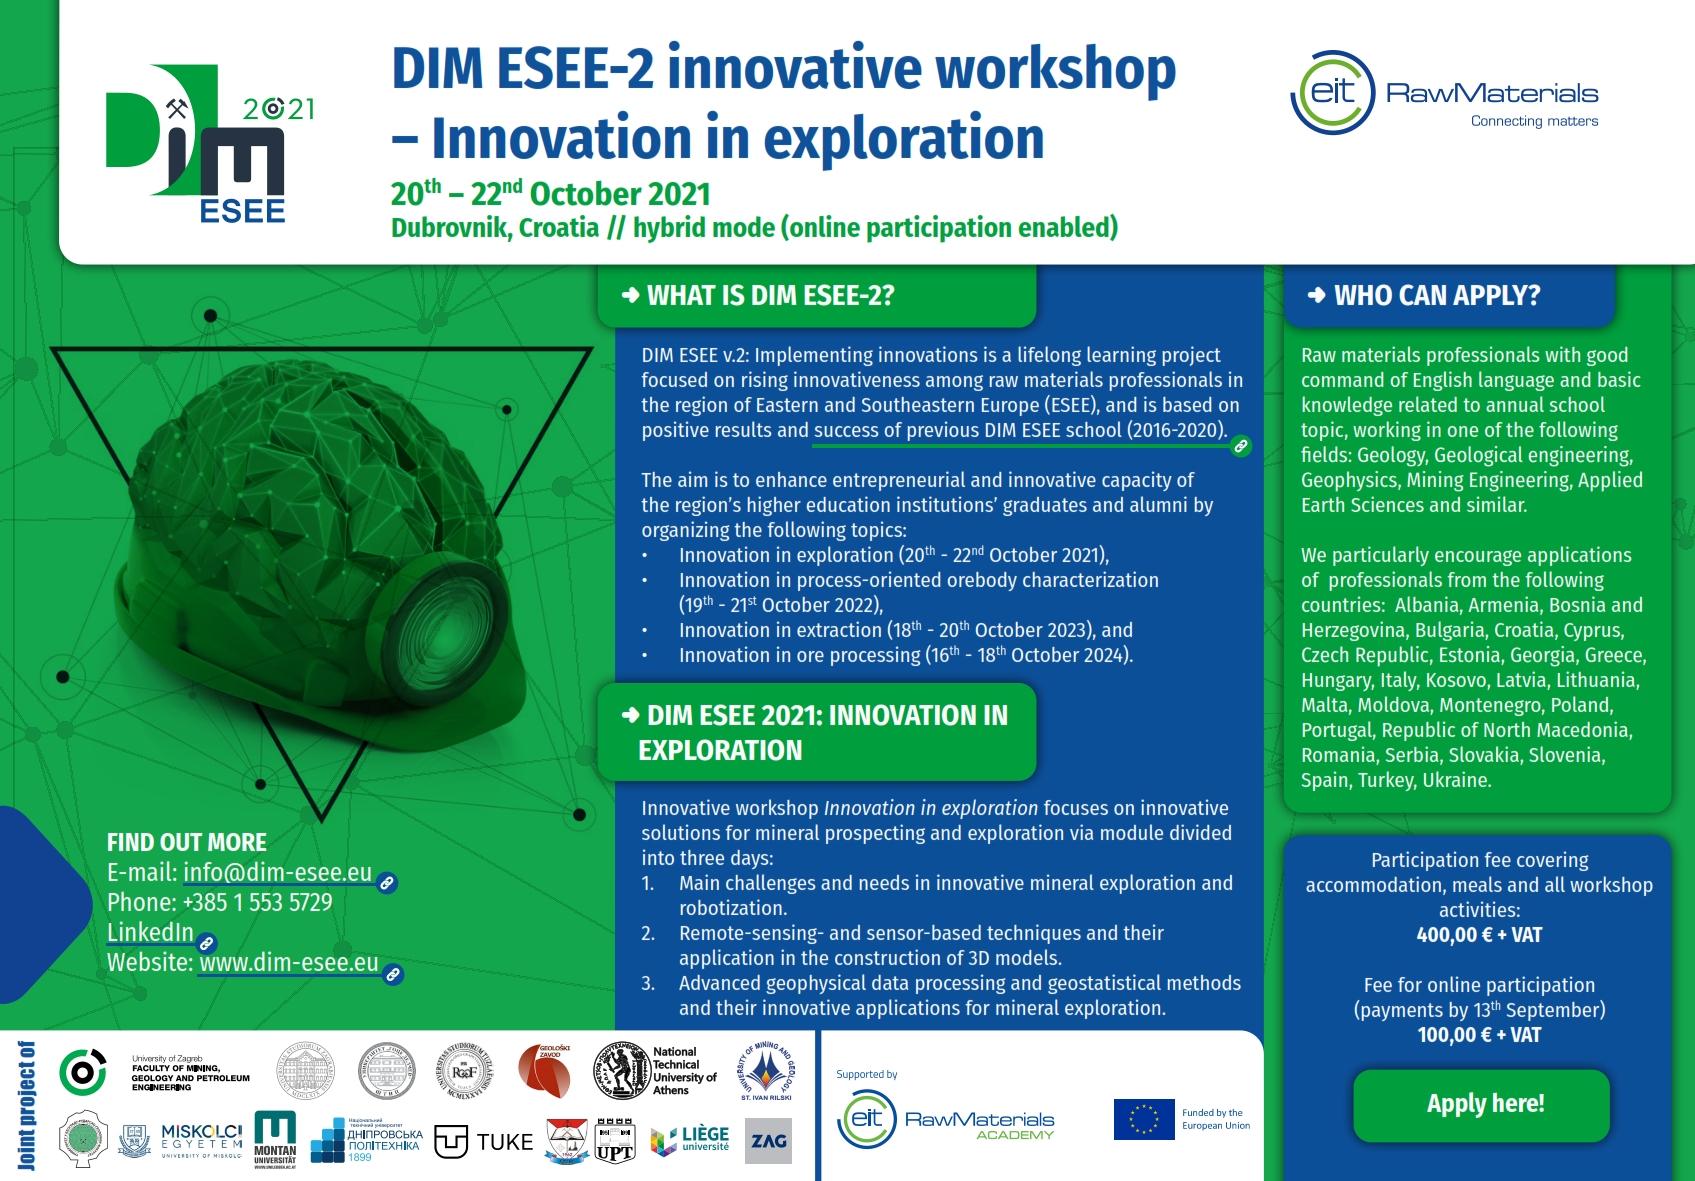 REGISTRATION AND FEES | DIM ESEE SCHOOL | IUC DUBROVNIK (dim-esee.eu)